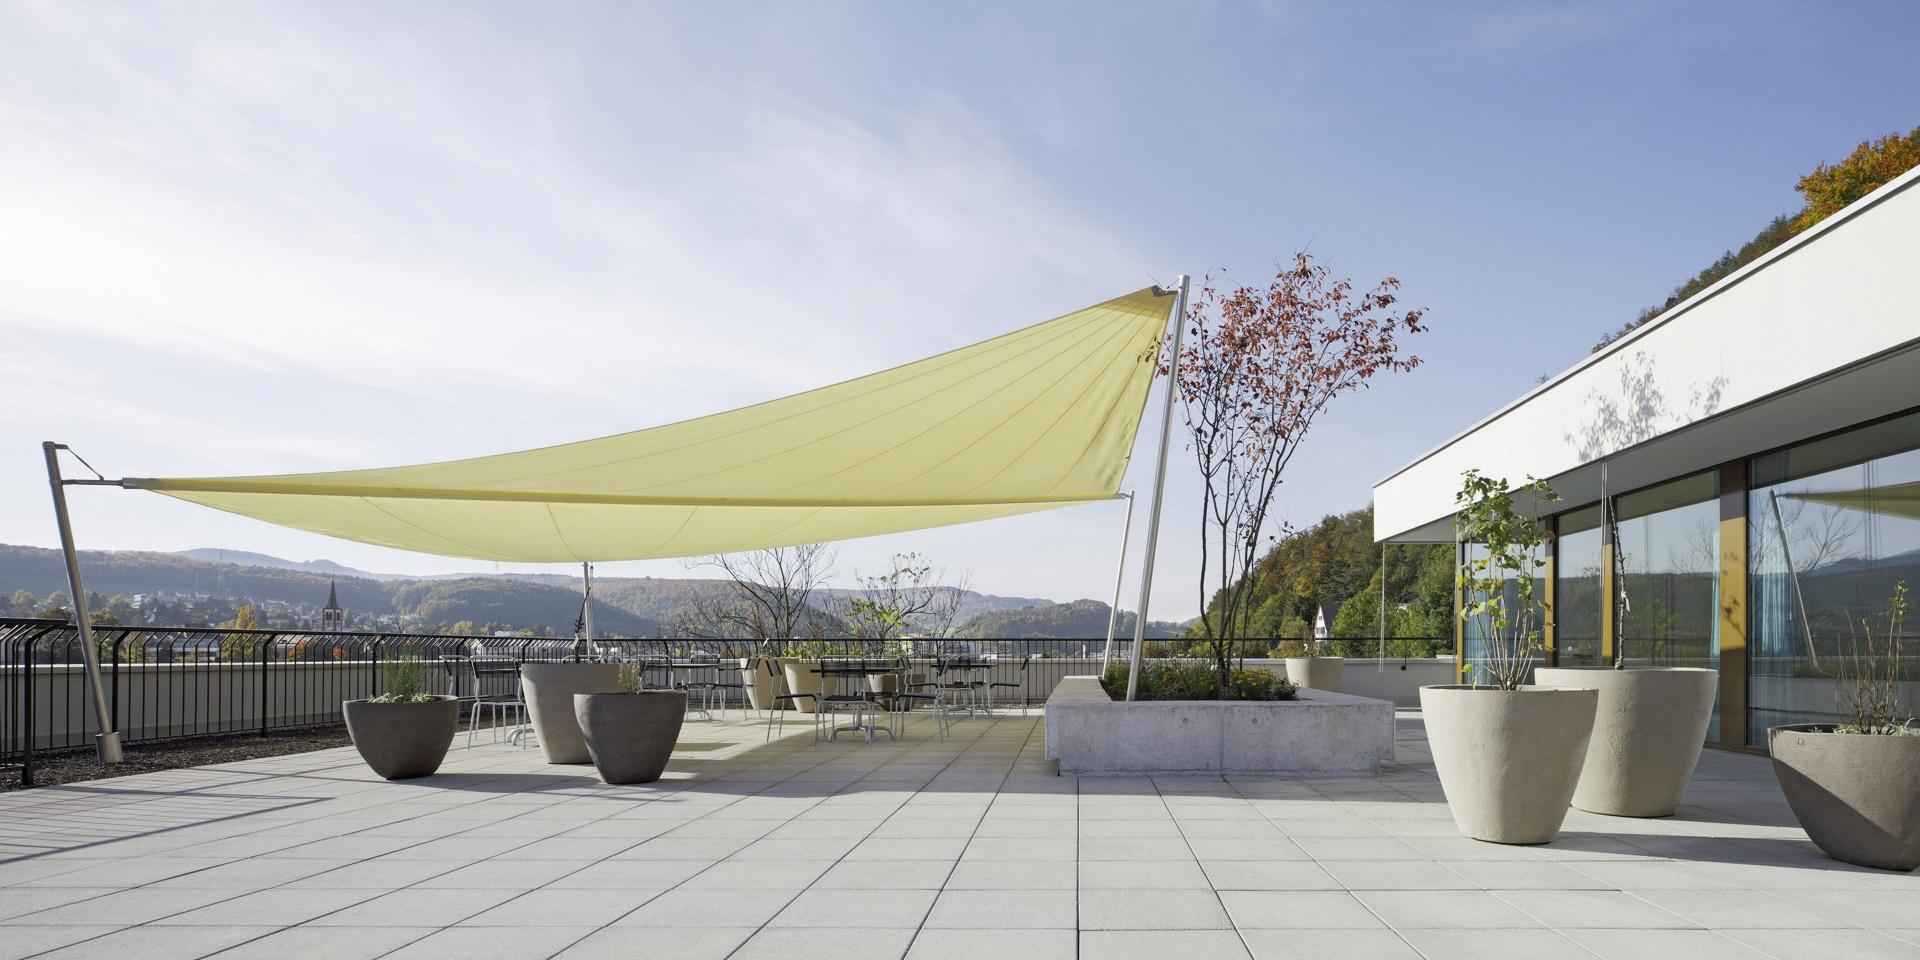 Brunnmatt_Dachterrasse © Tom Bisig, Basel